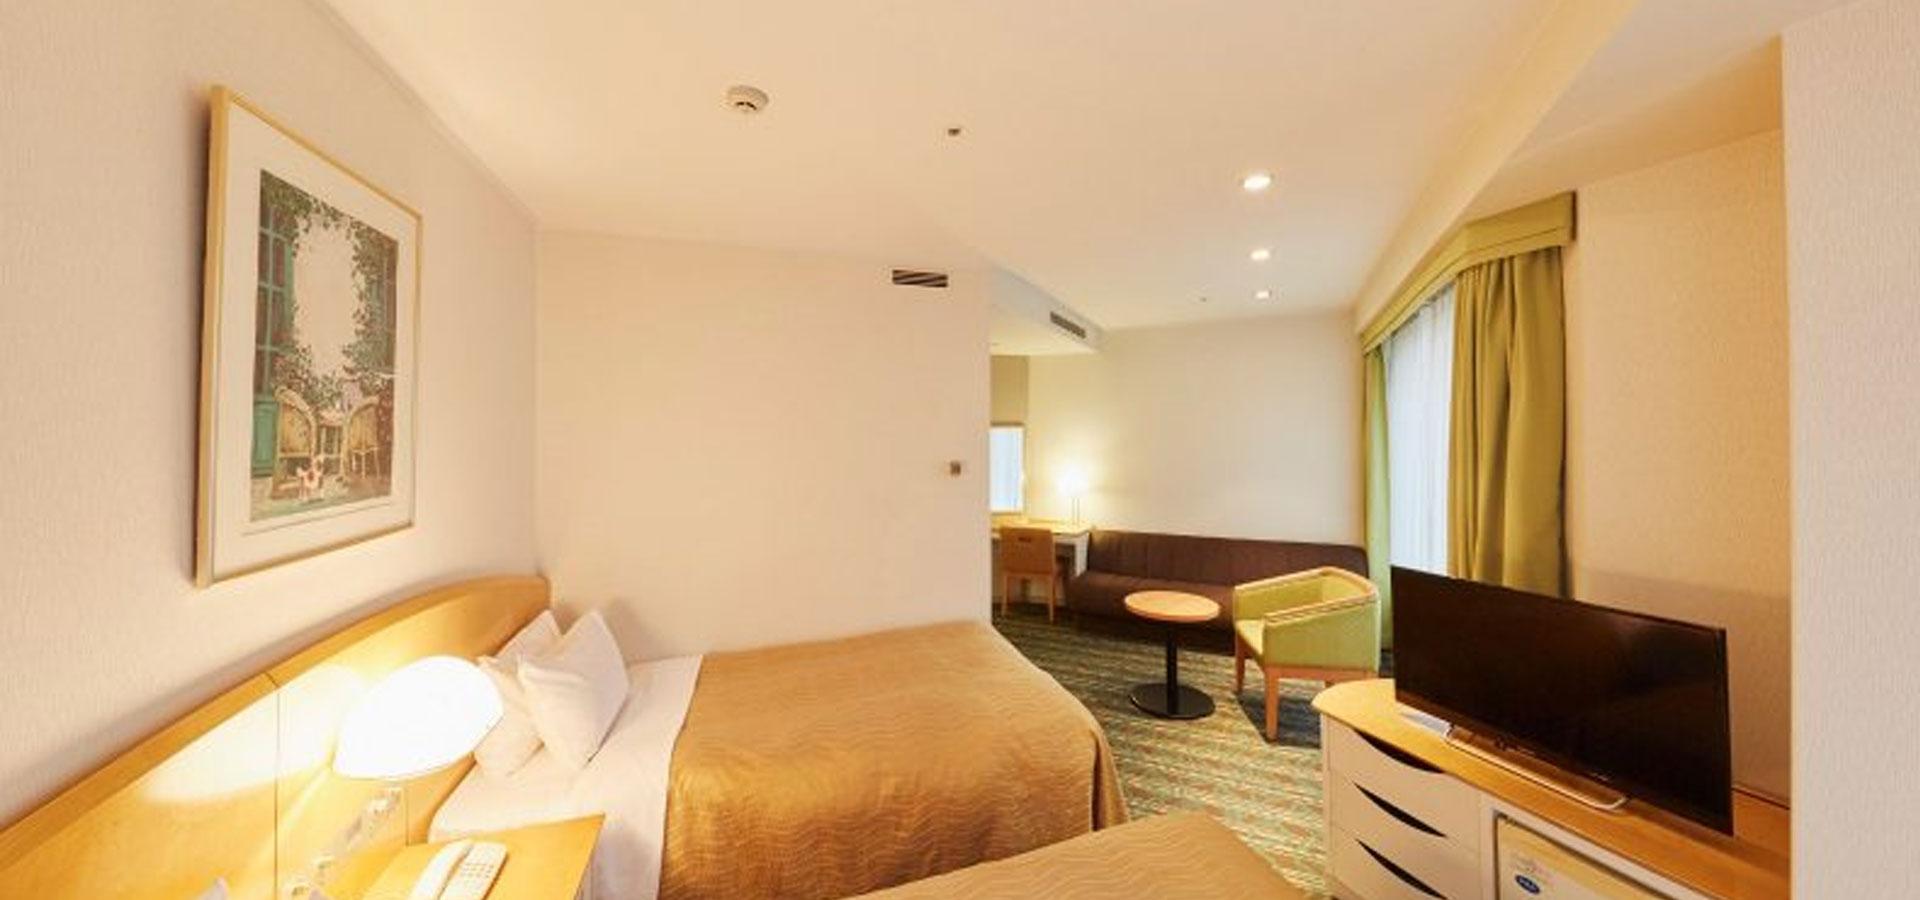 Corner Twin Room (26.5m2, 6th – 16th floors)